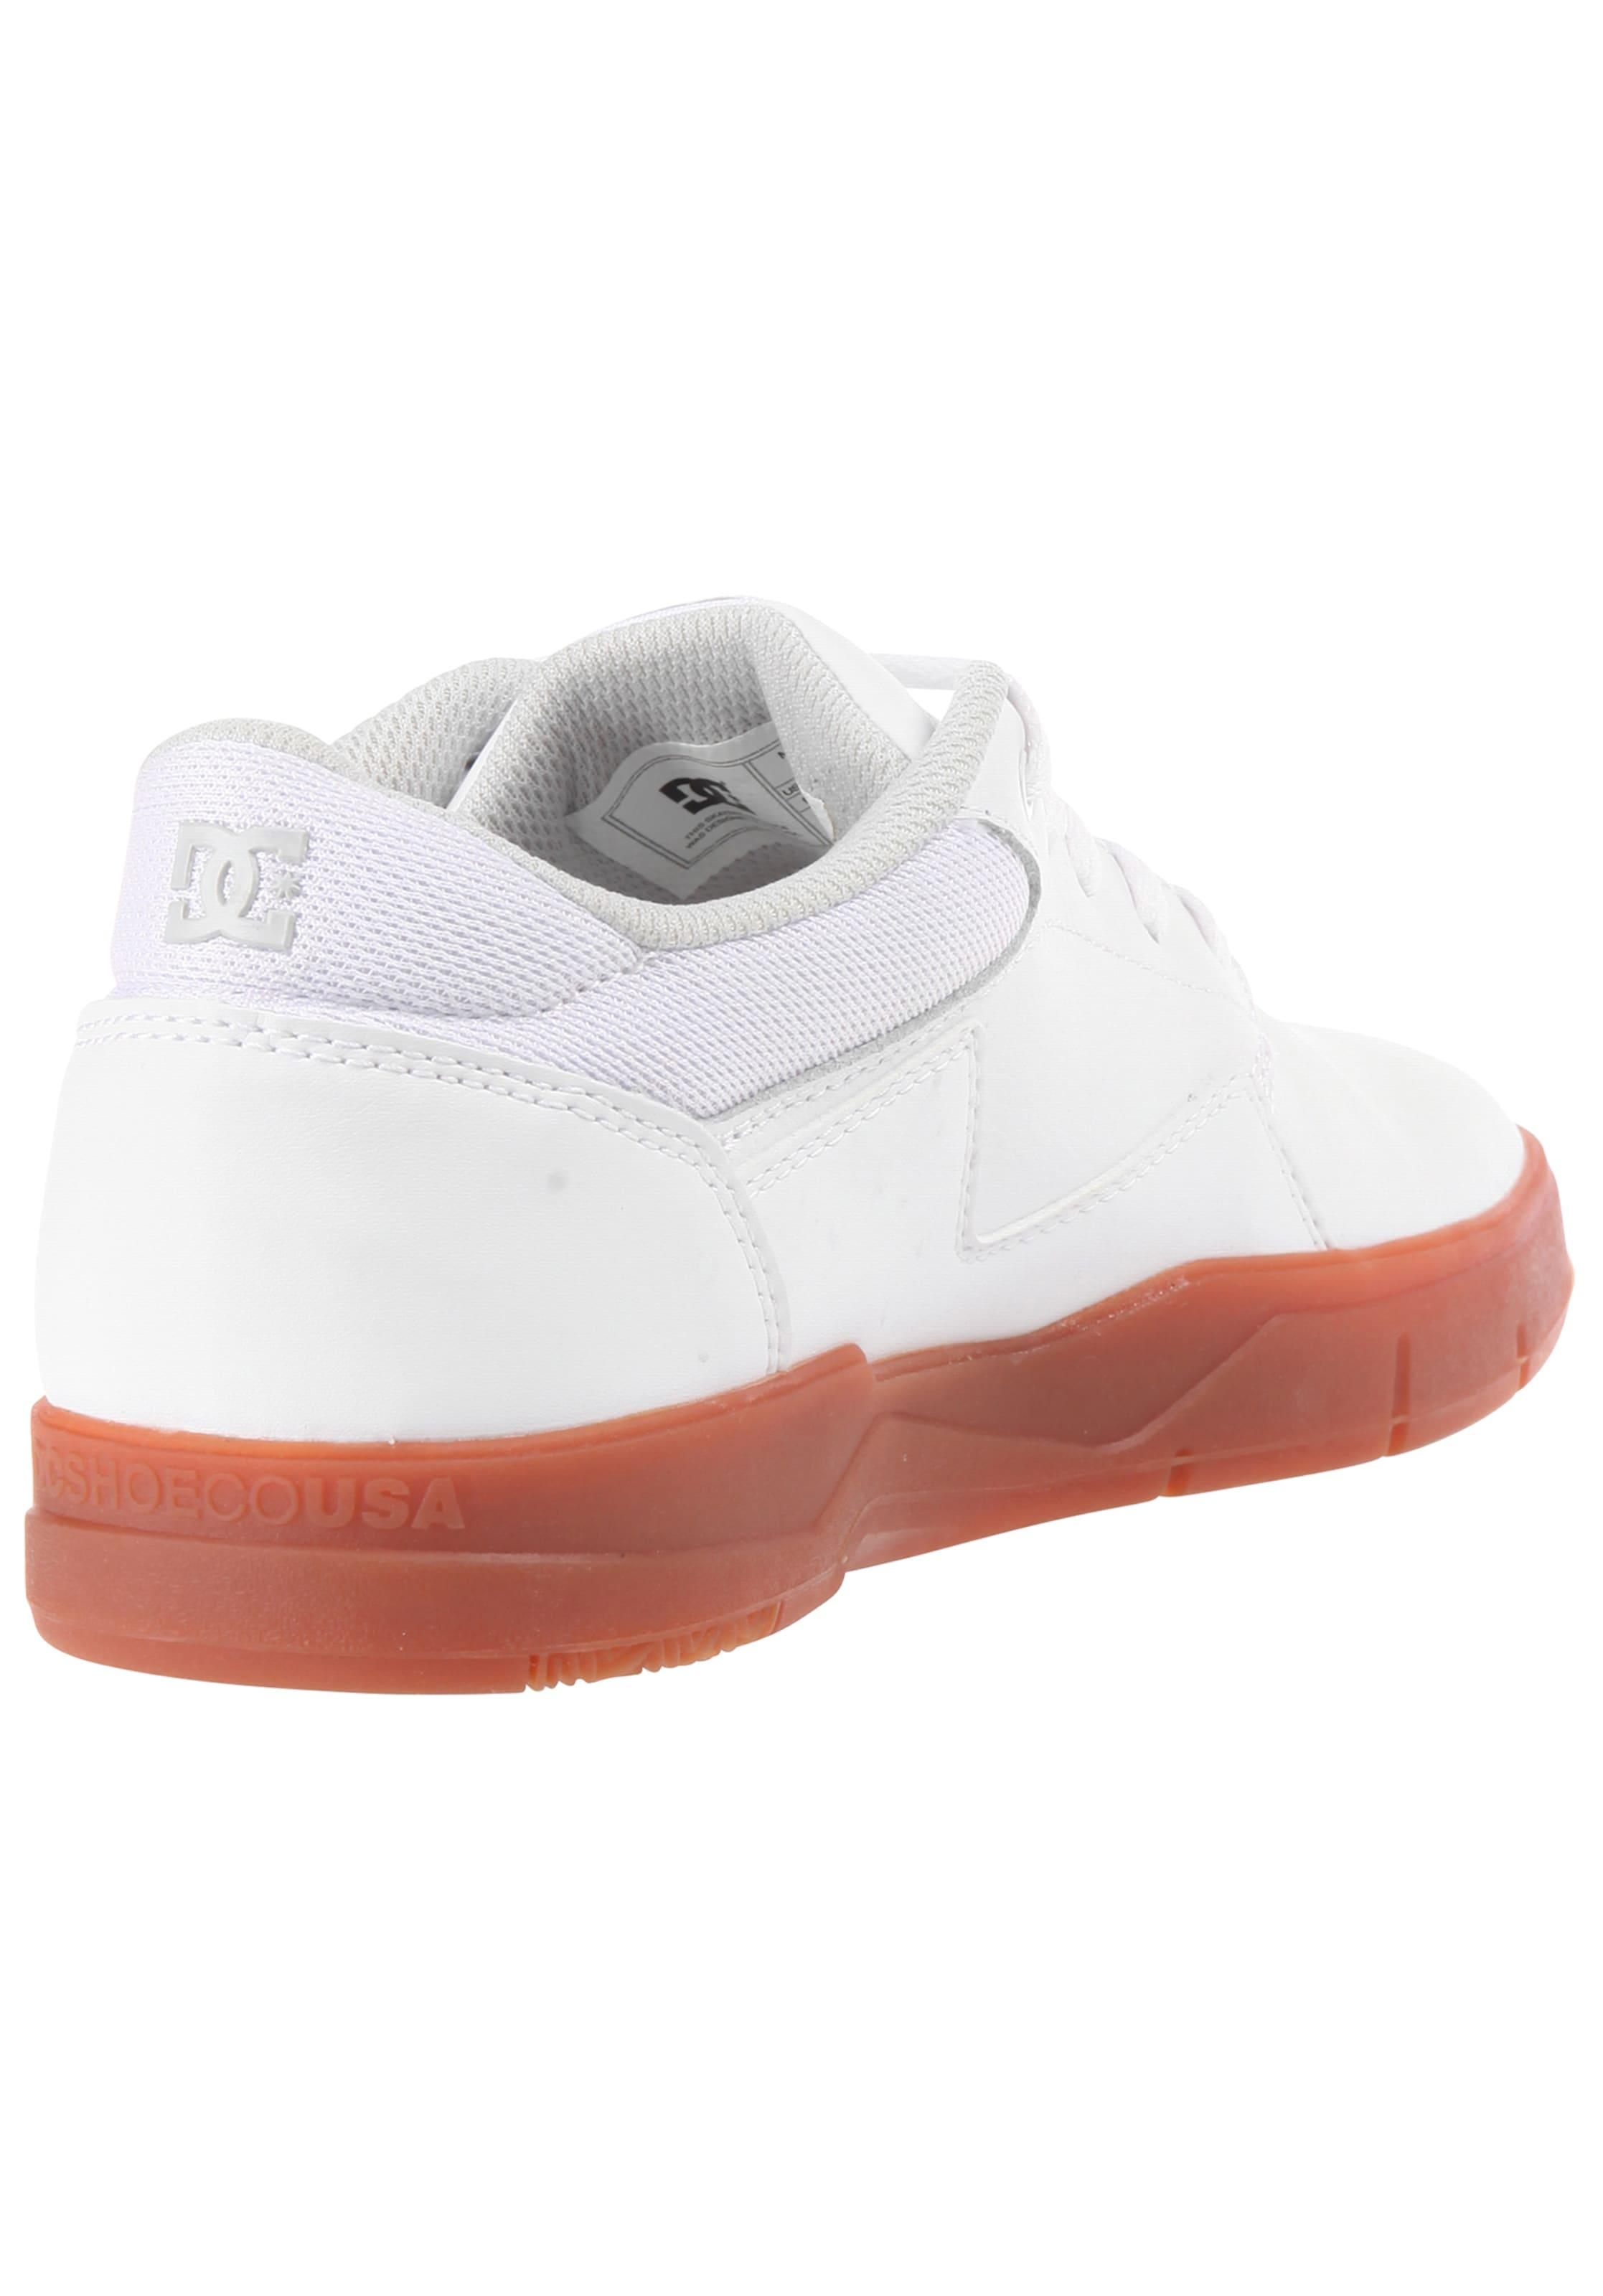 Dc Shoes 'barksdale' In DunkelorangeWeiß Sneaker uTOZXPki